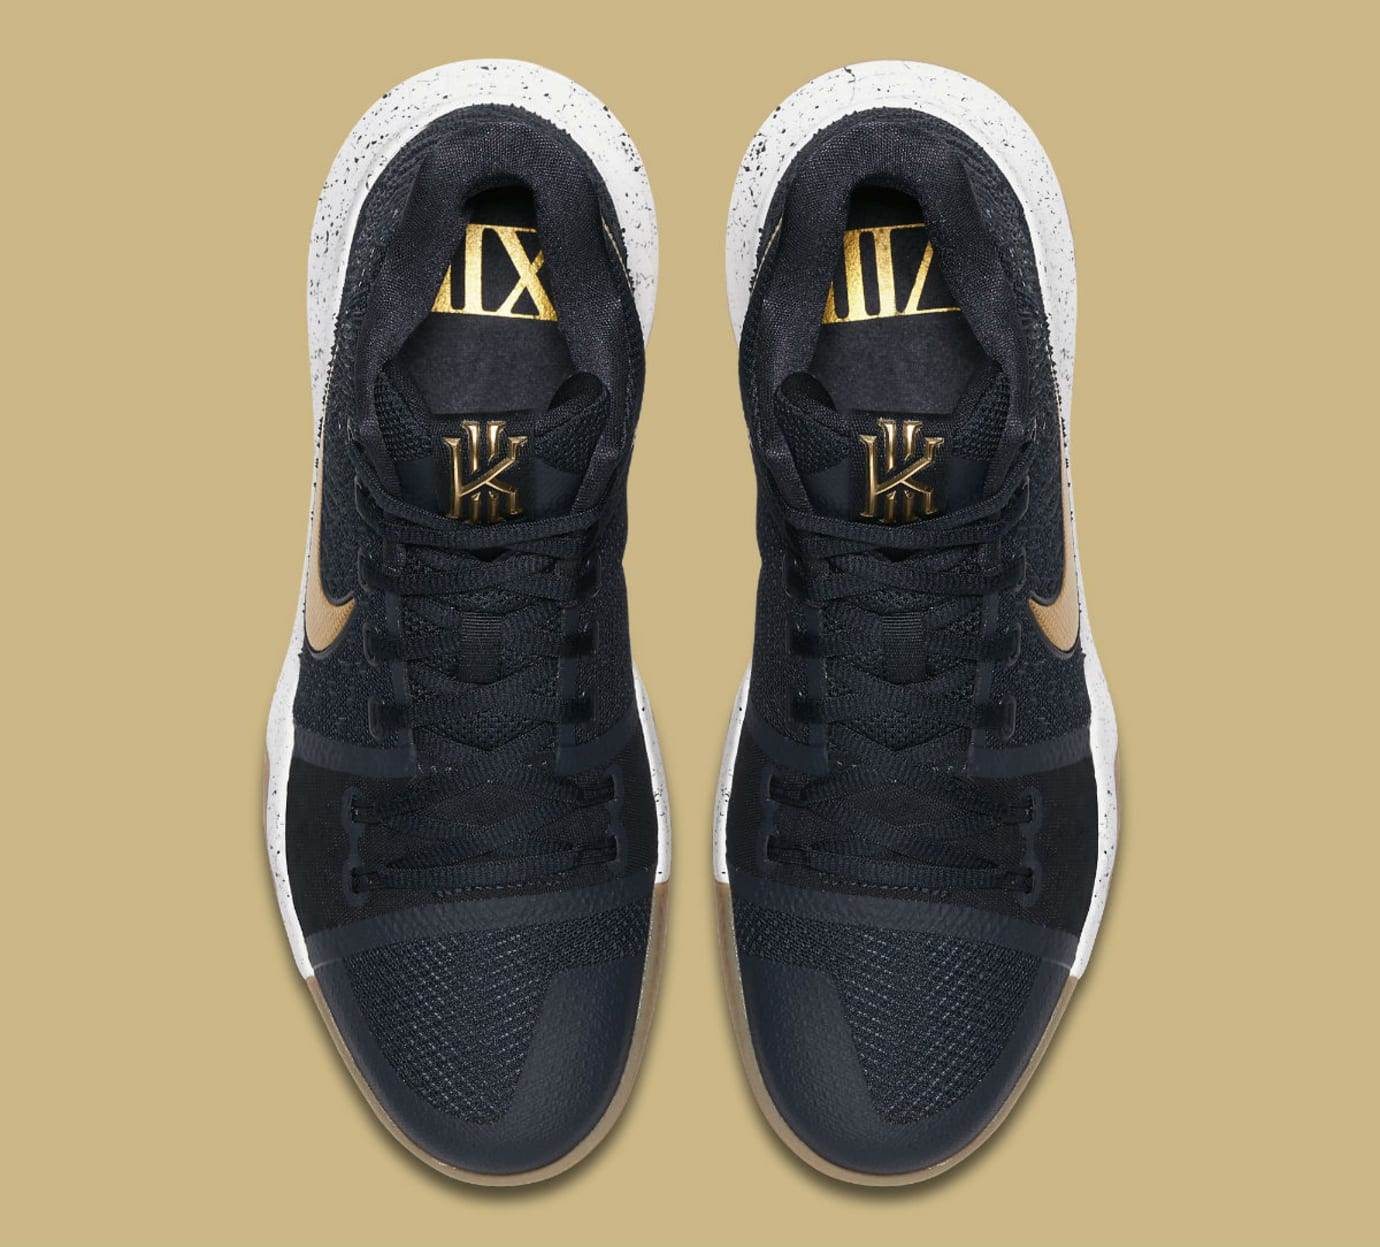 Nike Kyrie 3 Black Sail Metallic Gold Cool Grey Release Date Top 852395-400